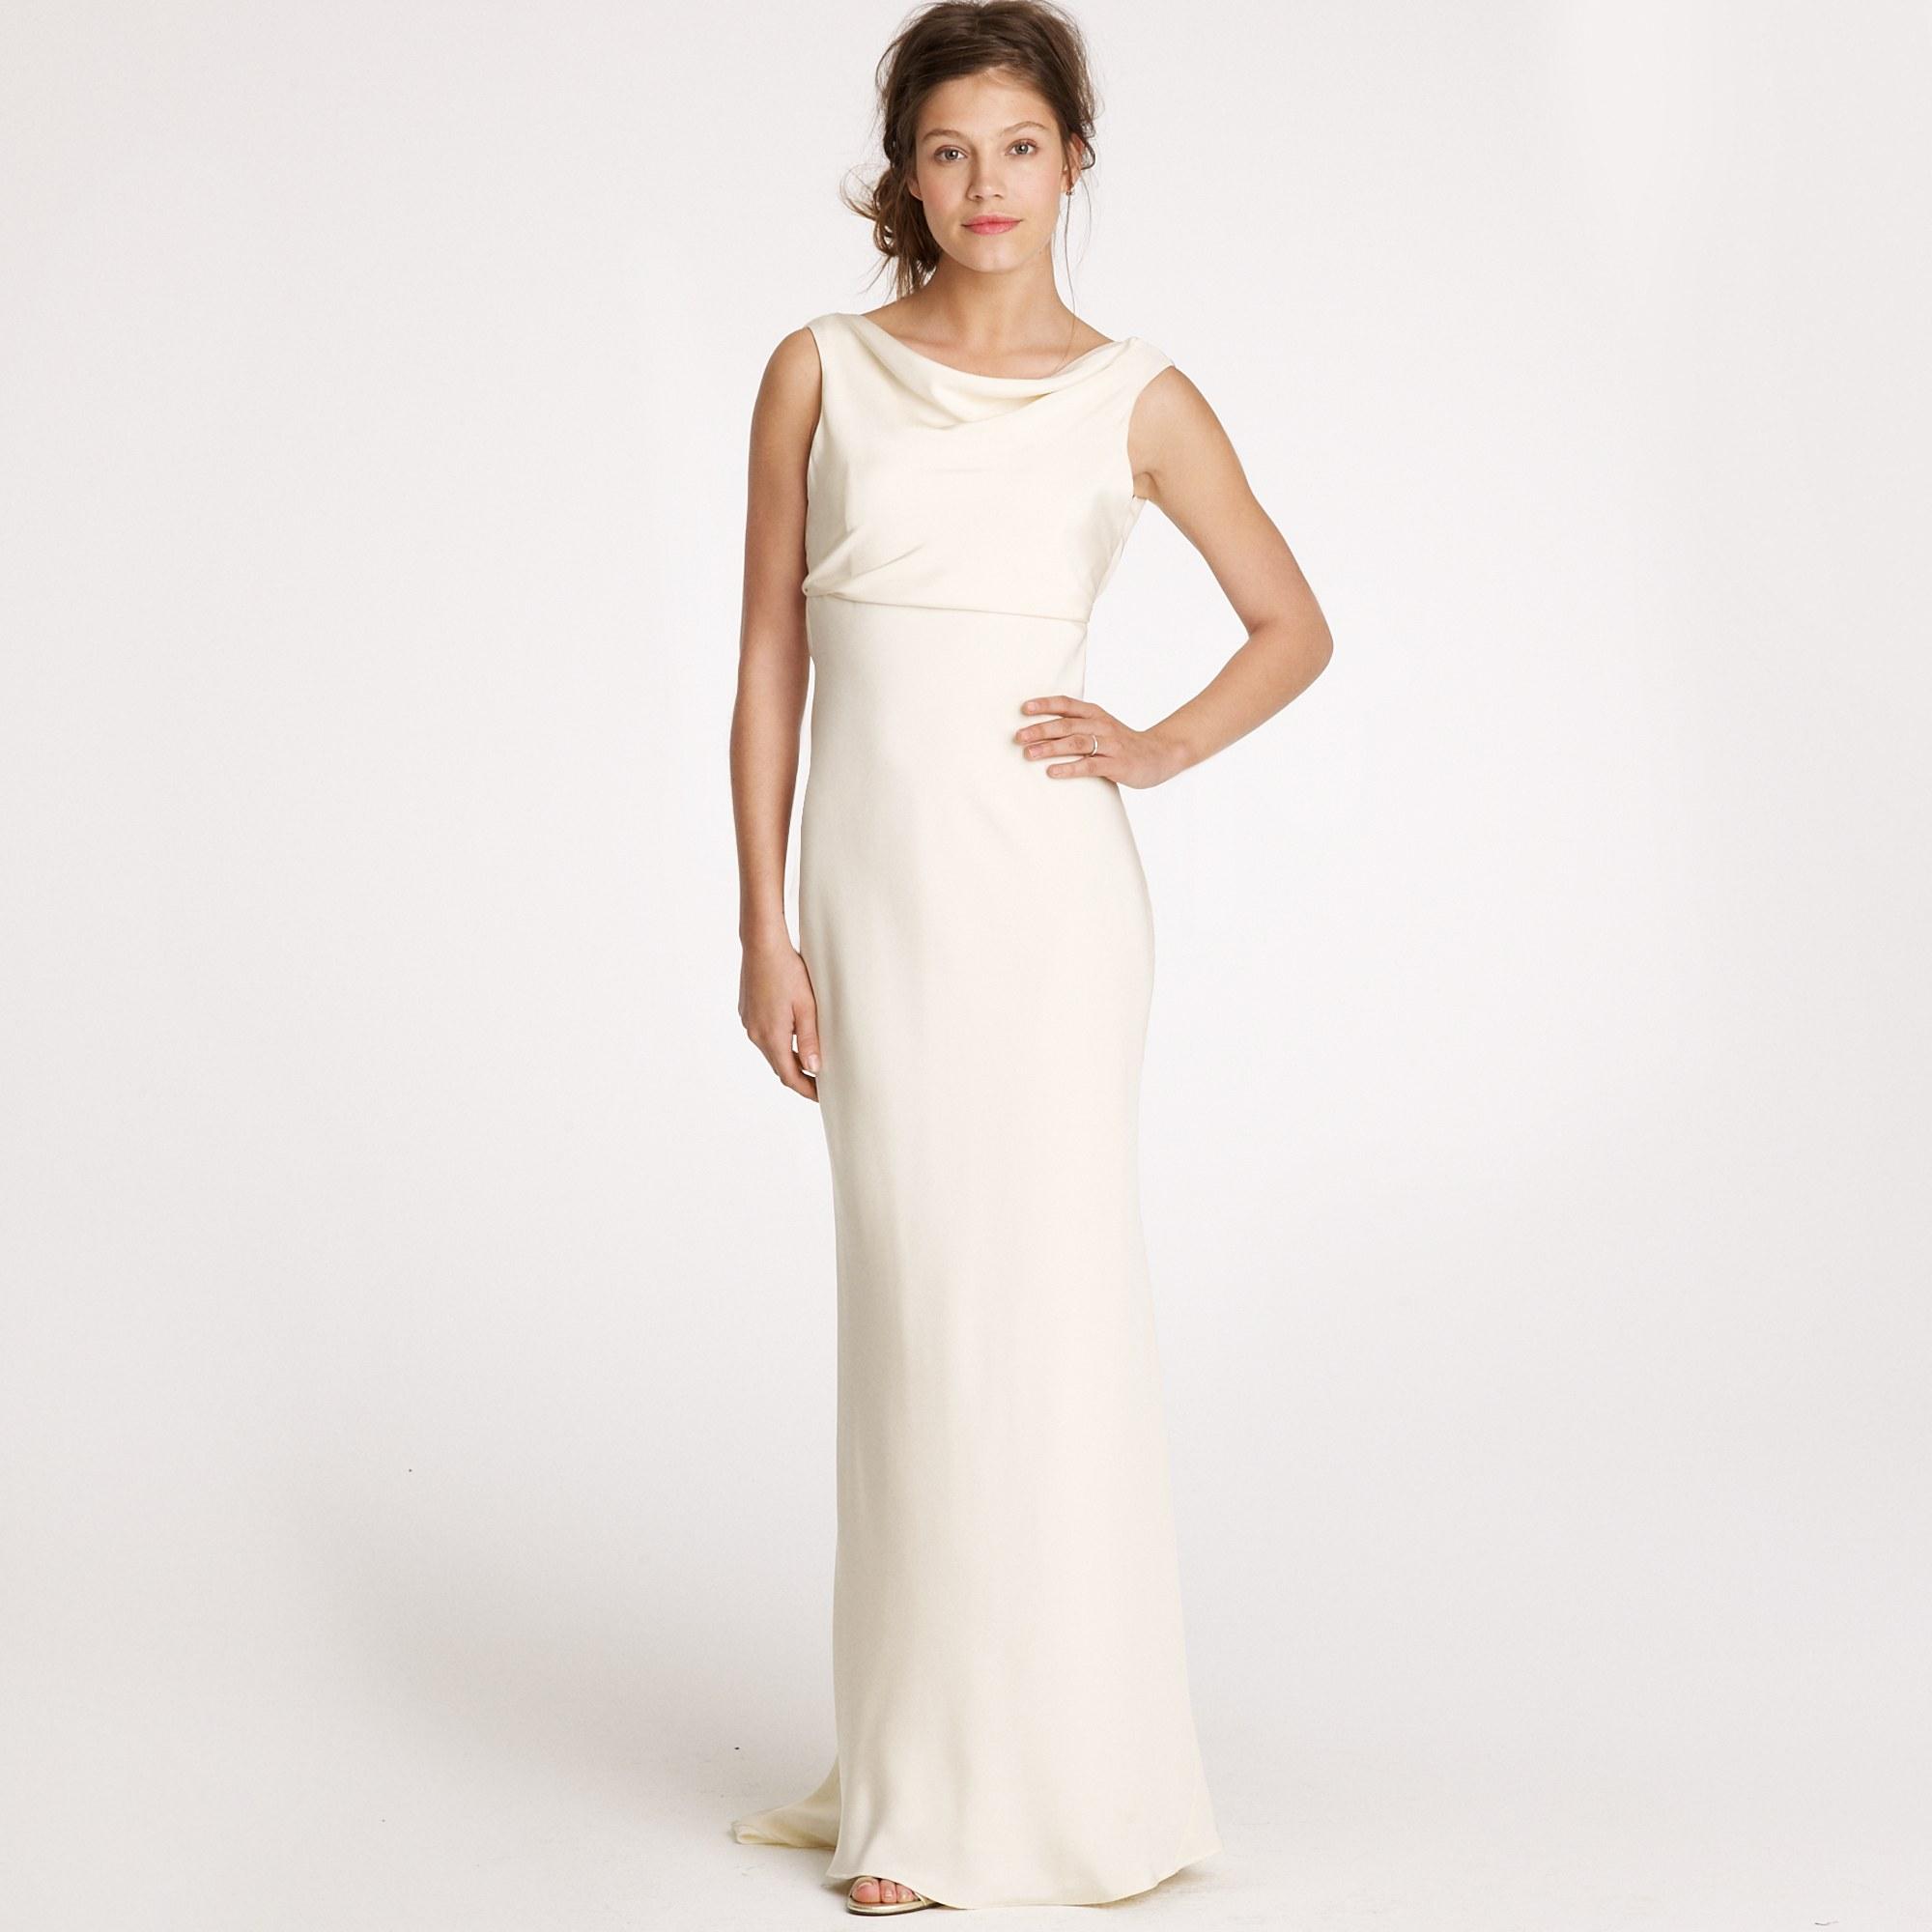 Lyst - J.Crew Anouk Gown in White